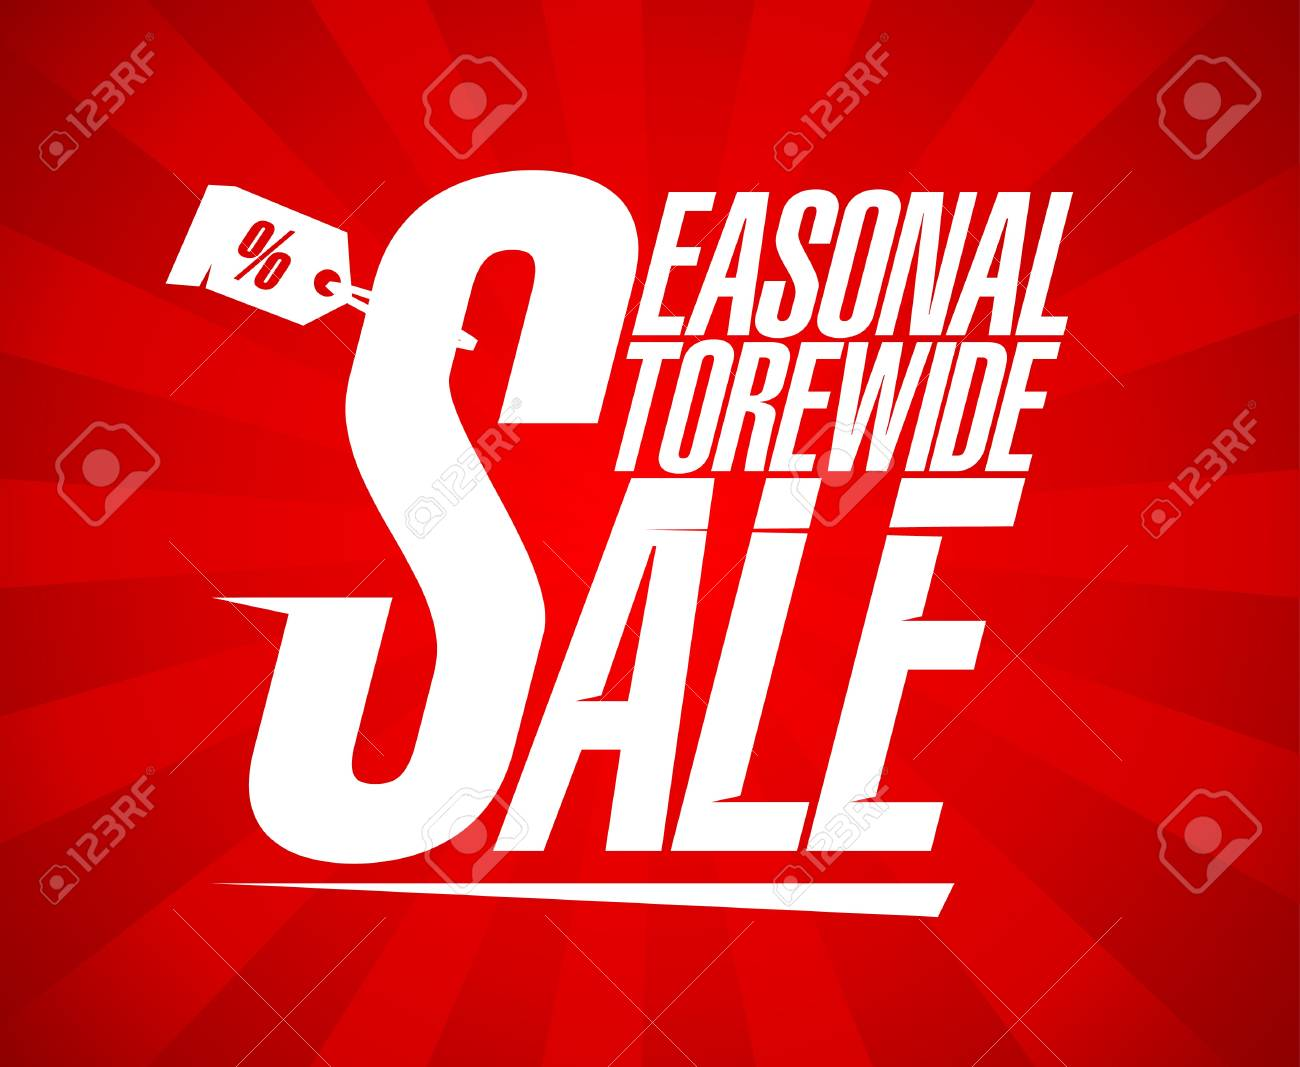 Seasonal storewide sale design template. Stock Vector - 17928795